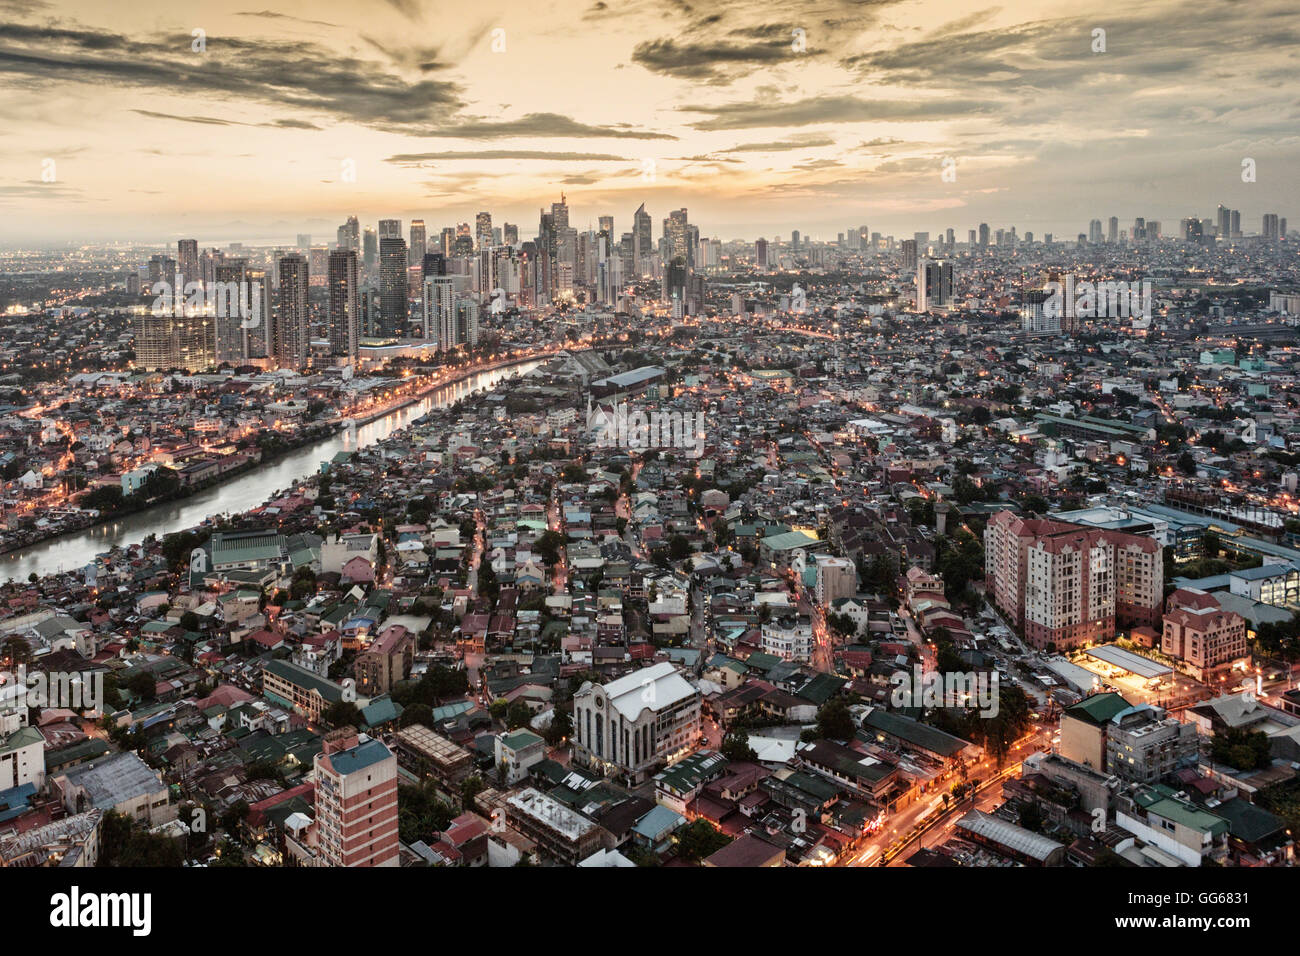 Night view of Makati and Pasig river, Manila, Philippines - Stock Image